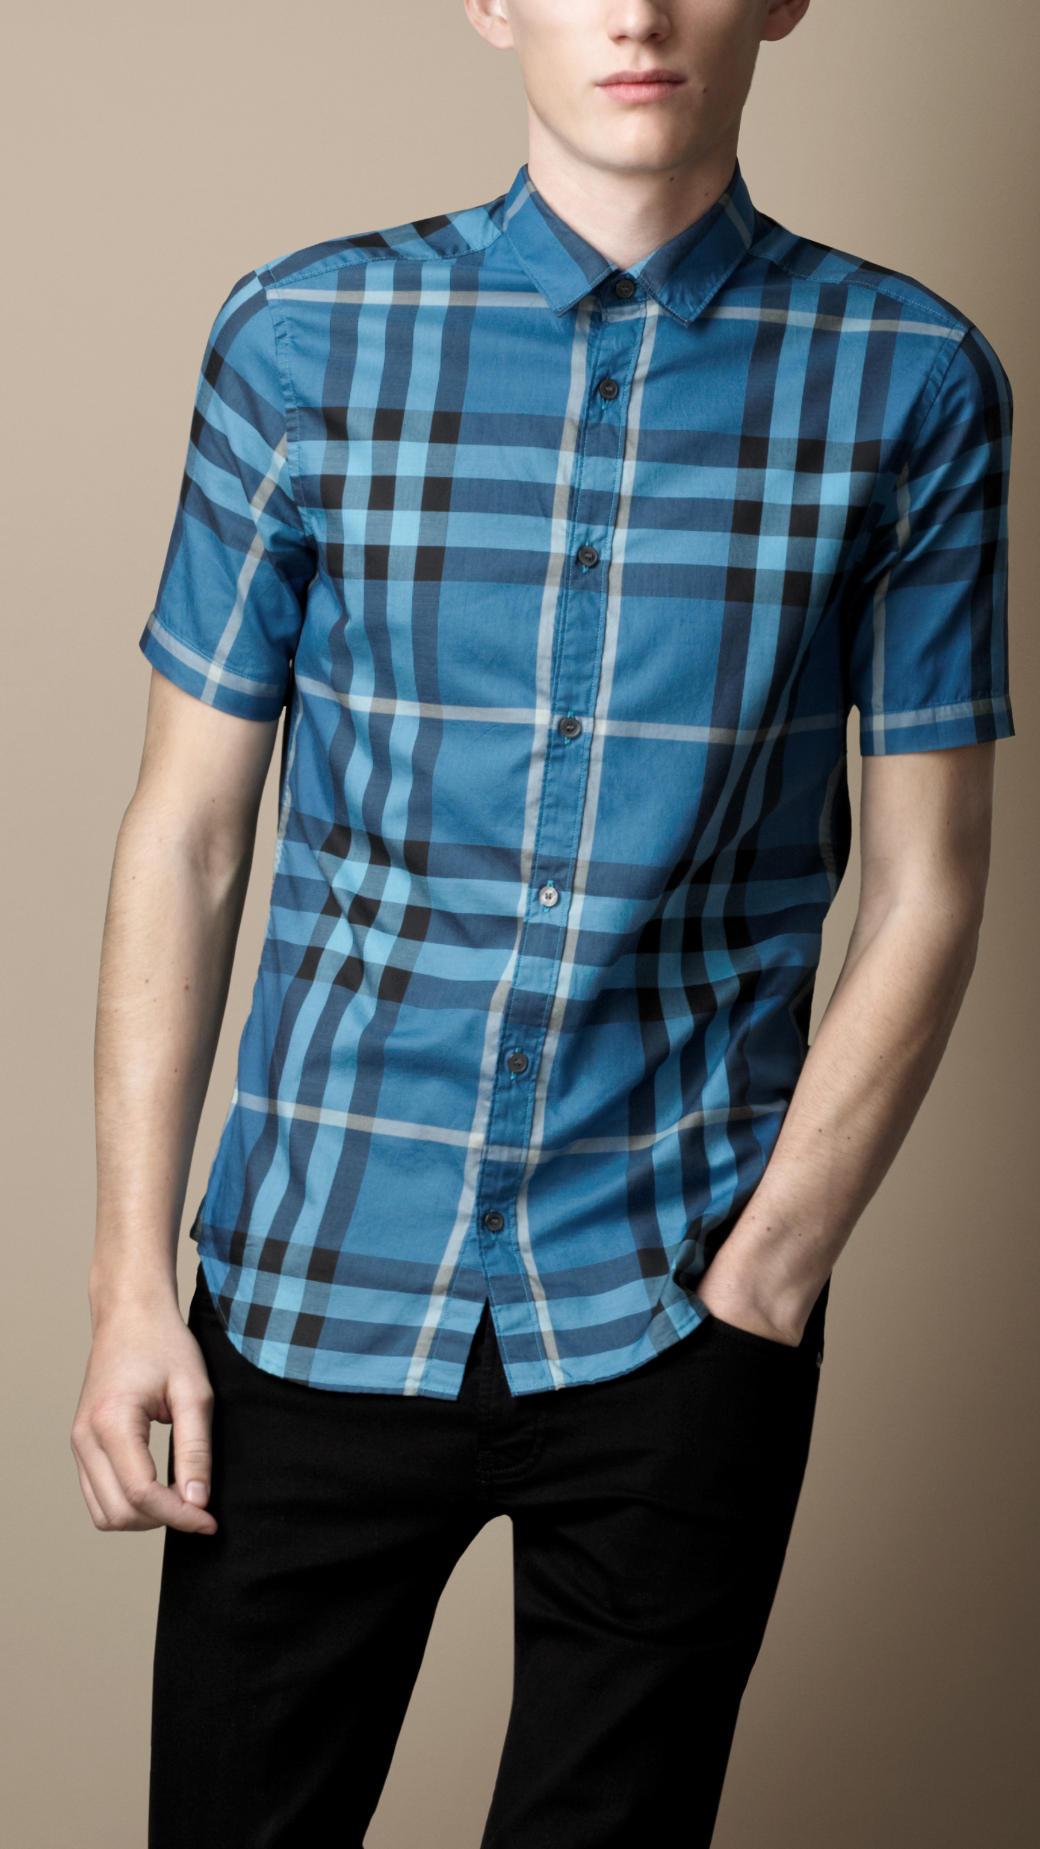 5e8ec652a55 Burberry Brit Short Sleeve Check Shirt in Blue for Men - Lyst